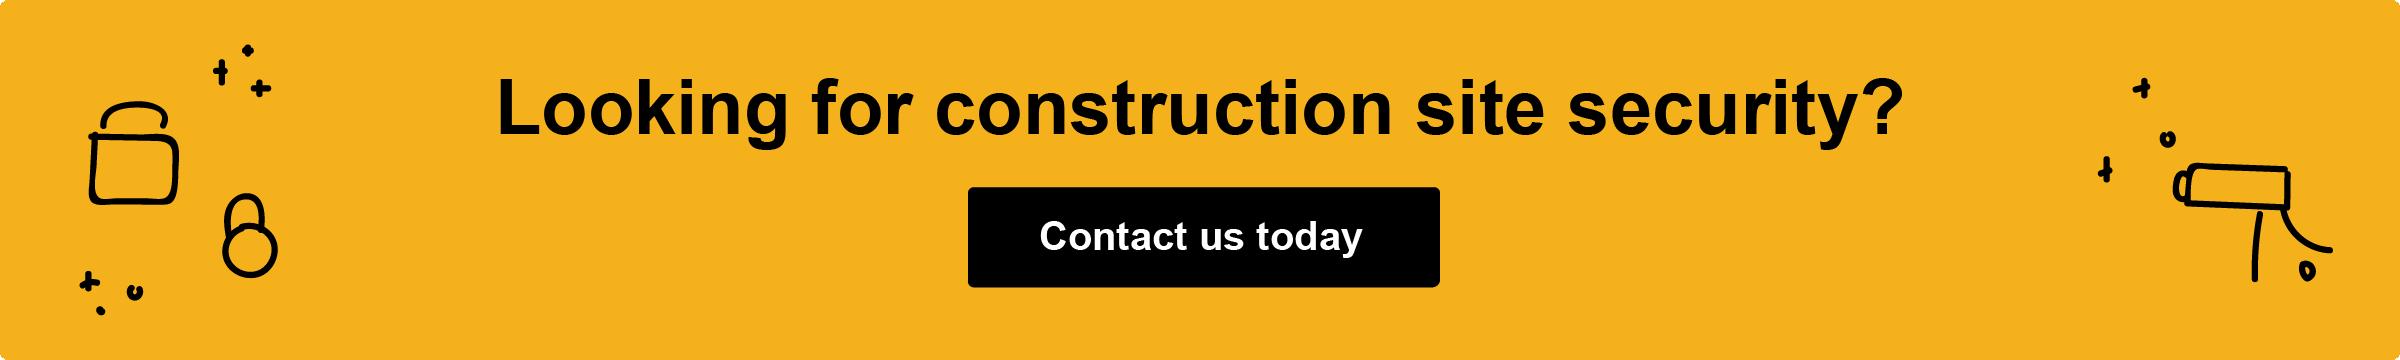 CSA Contact Us Construction Site Security